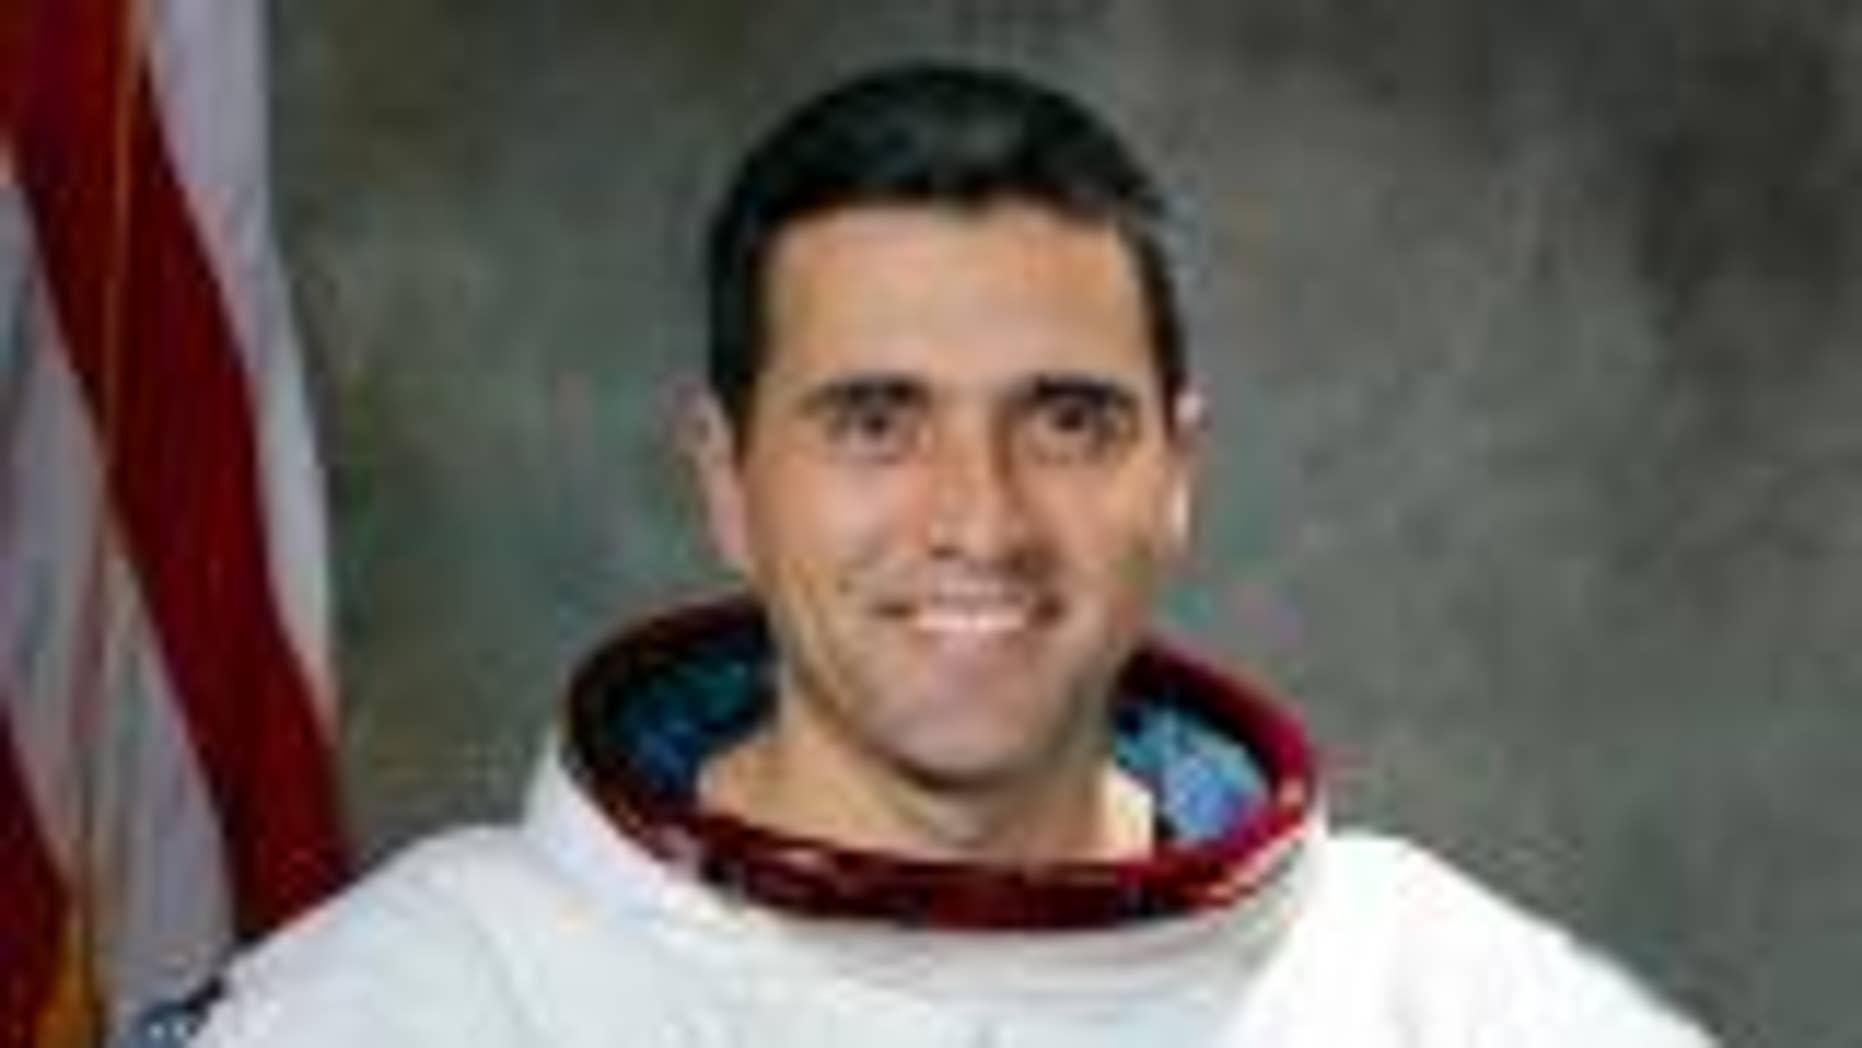 Harrison Schmitt during his time as a NASA astronaut (AP photo)